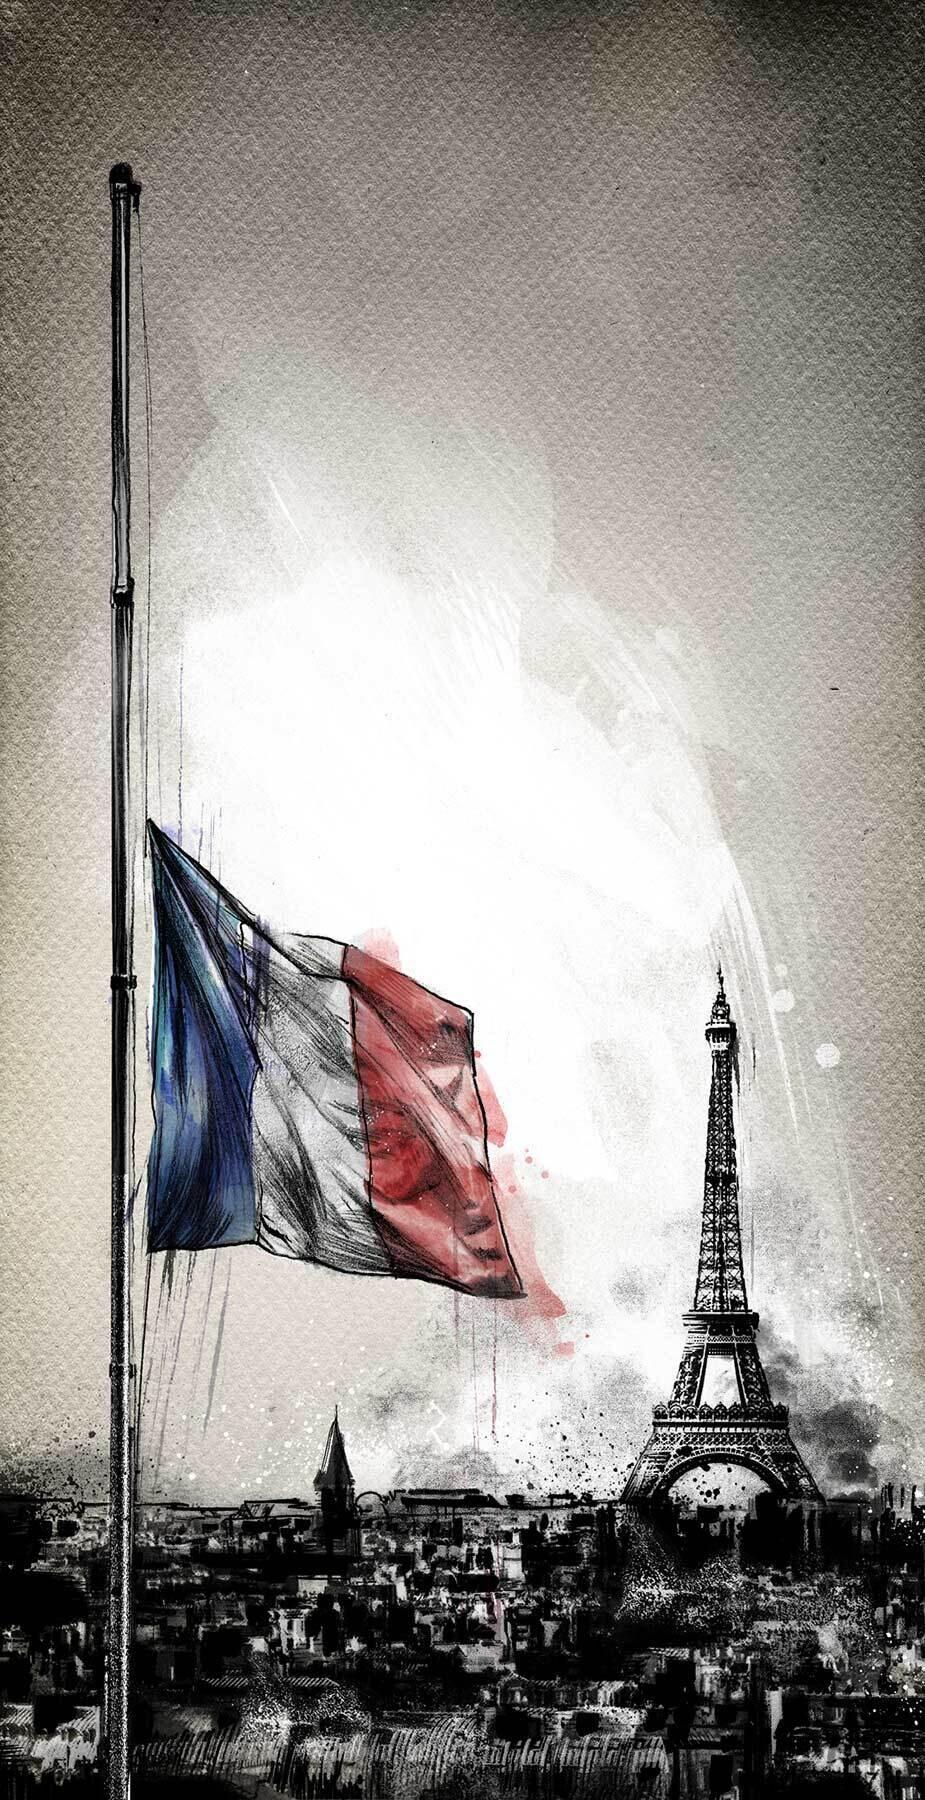 Paris Attentat Frankreich Illustration Trauer Editorial Eiffelturm - Kornel Illustration | Kornel Stadler portfolio